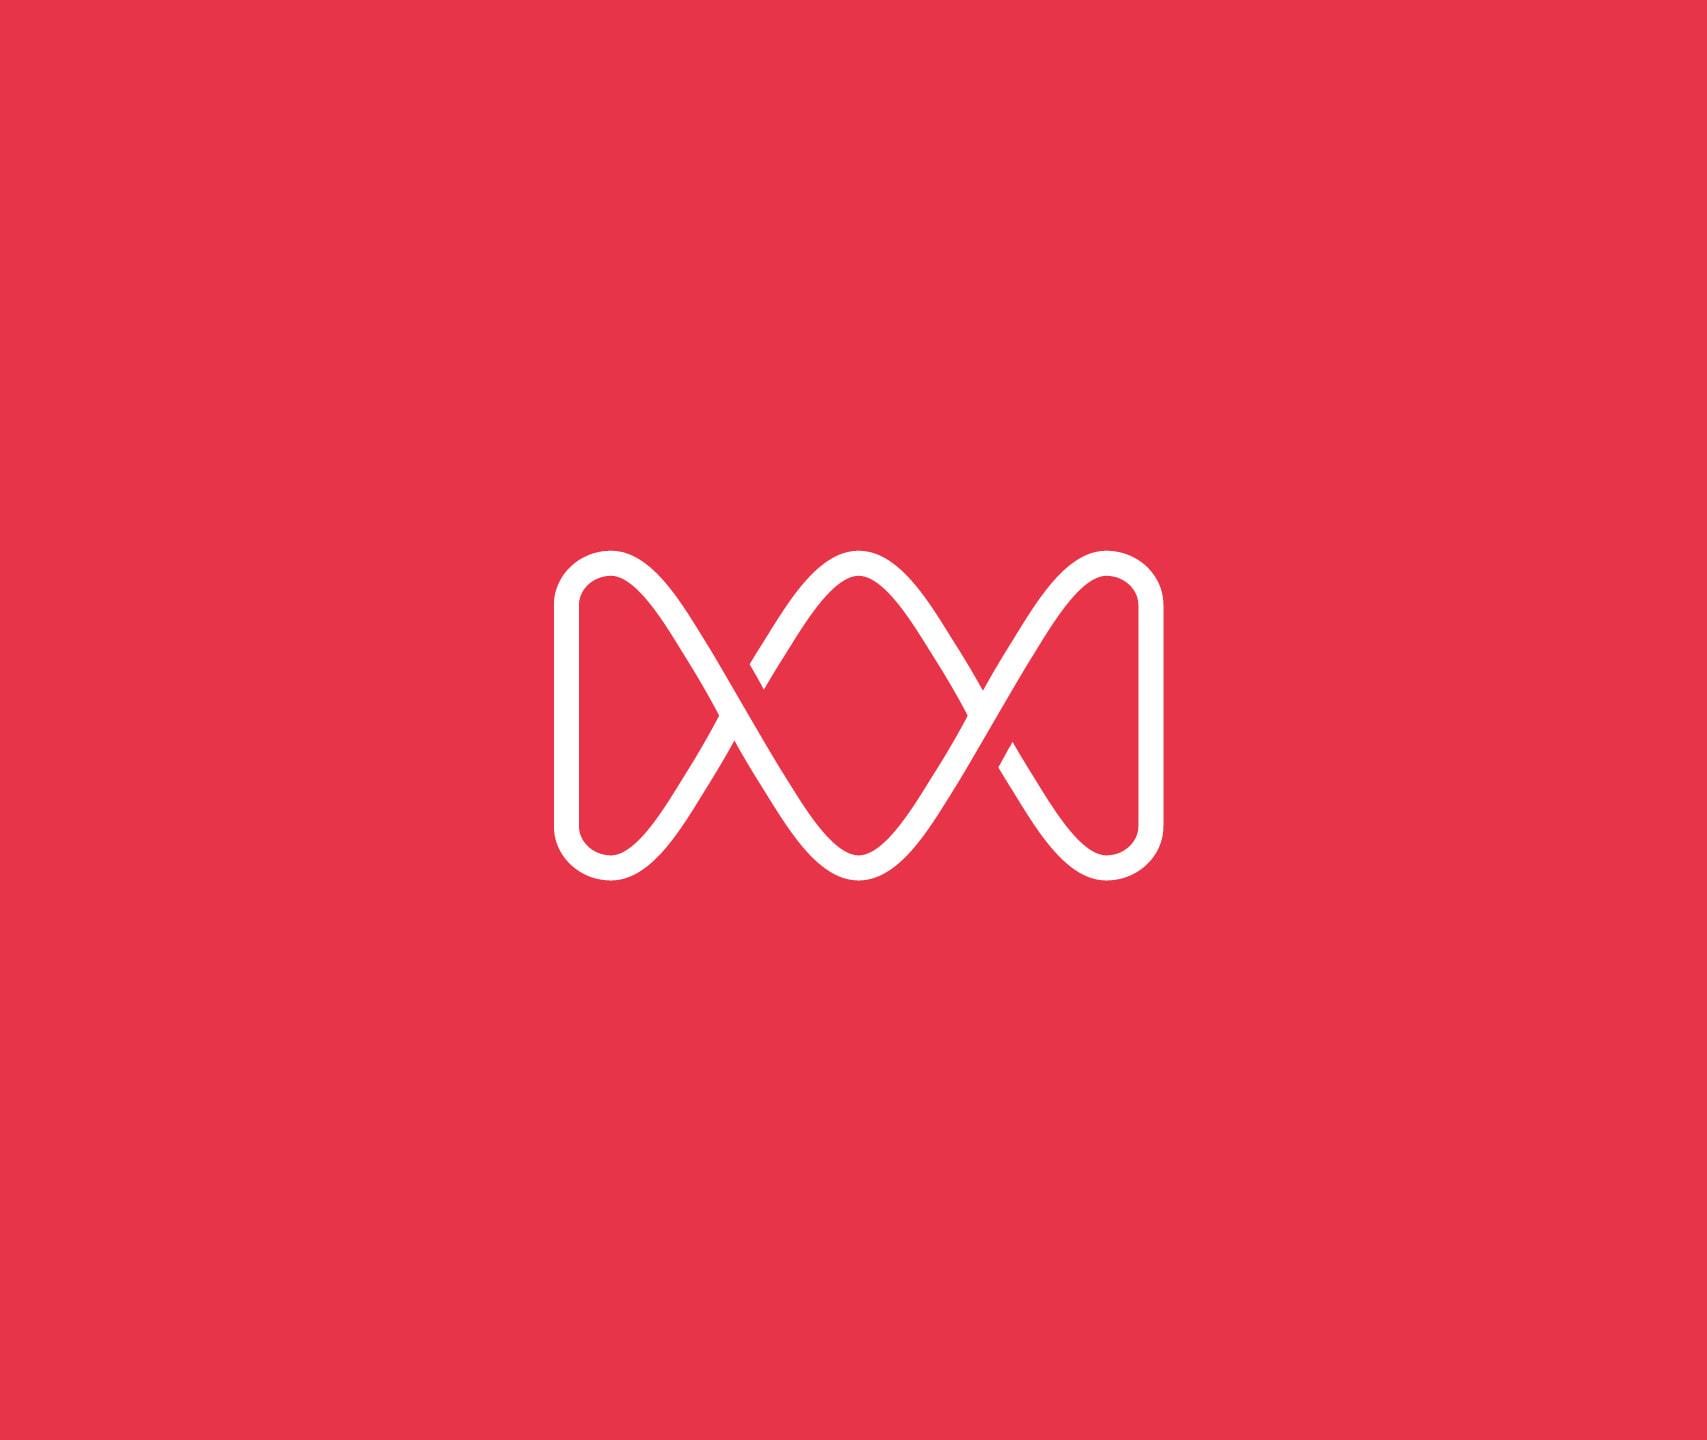 mantik-digital-branding-development-agency-creative-app-ui-web-branding-218-min